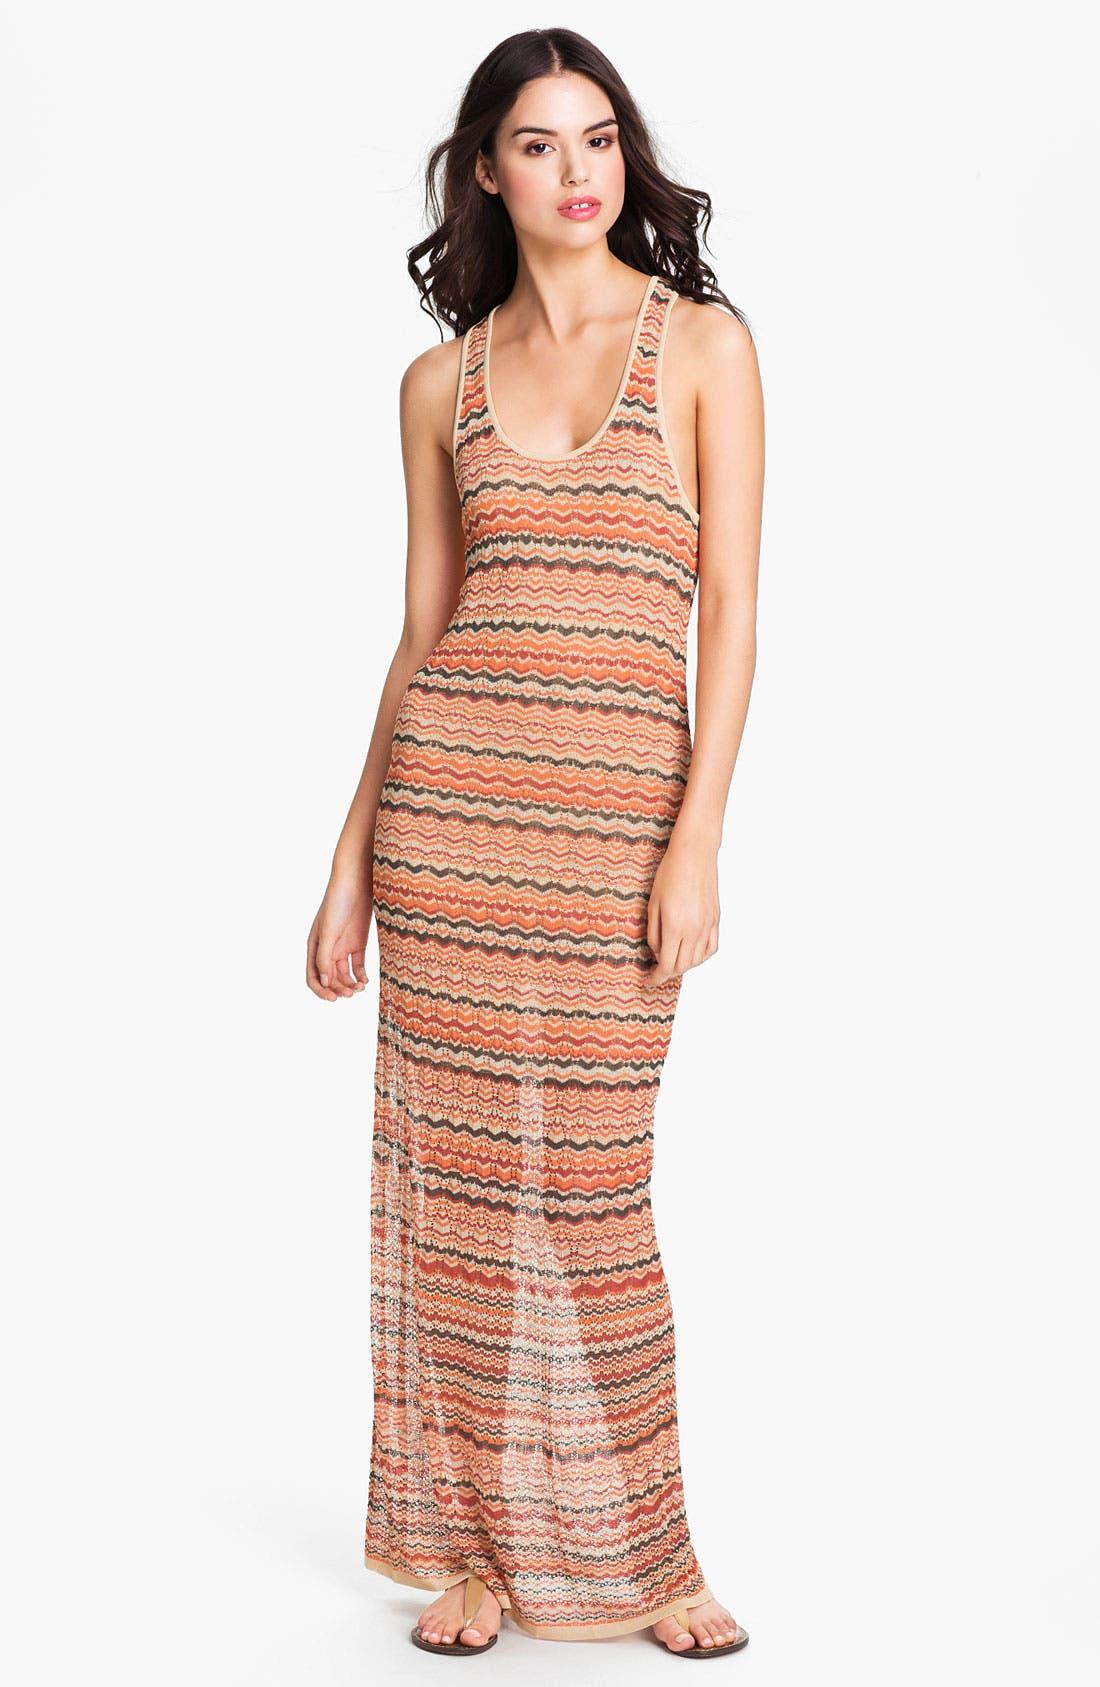 Alternate Image 1 Selected - Haute Hippie Flame Knit Racerback Maxi Dress